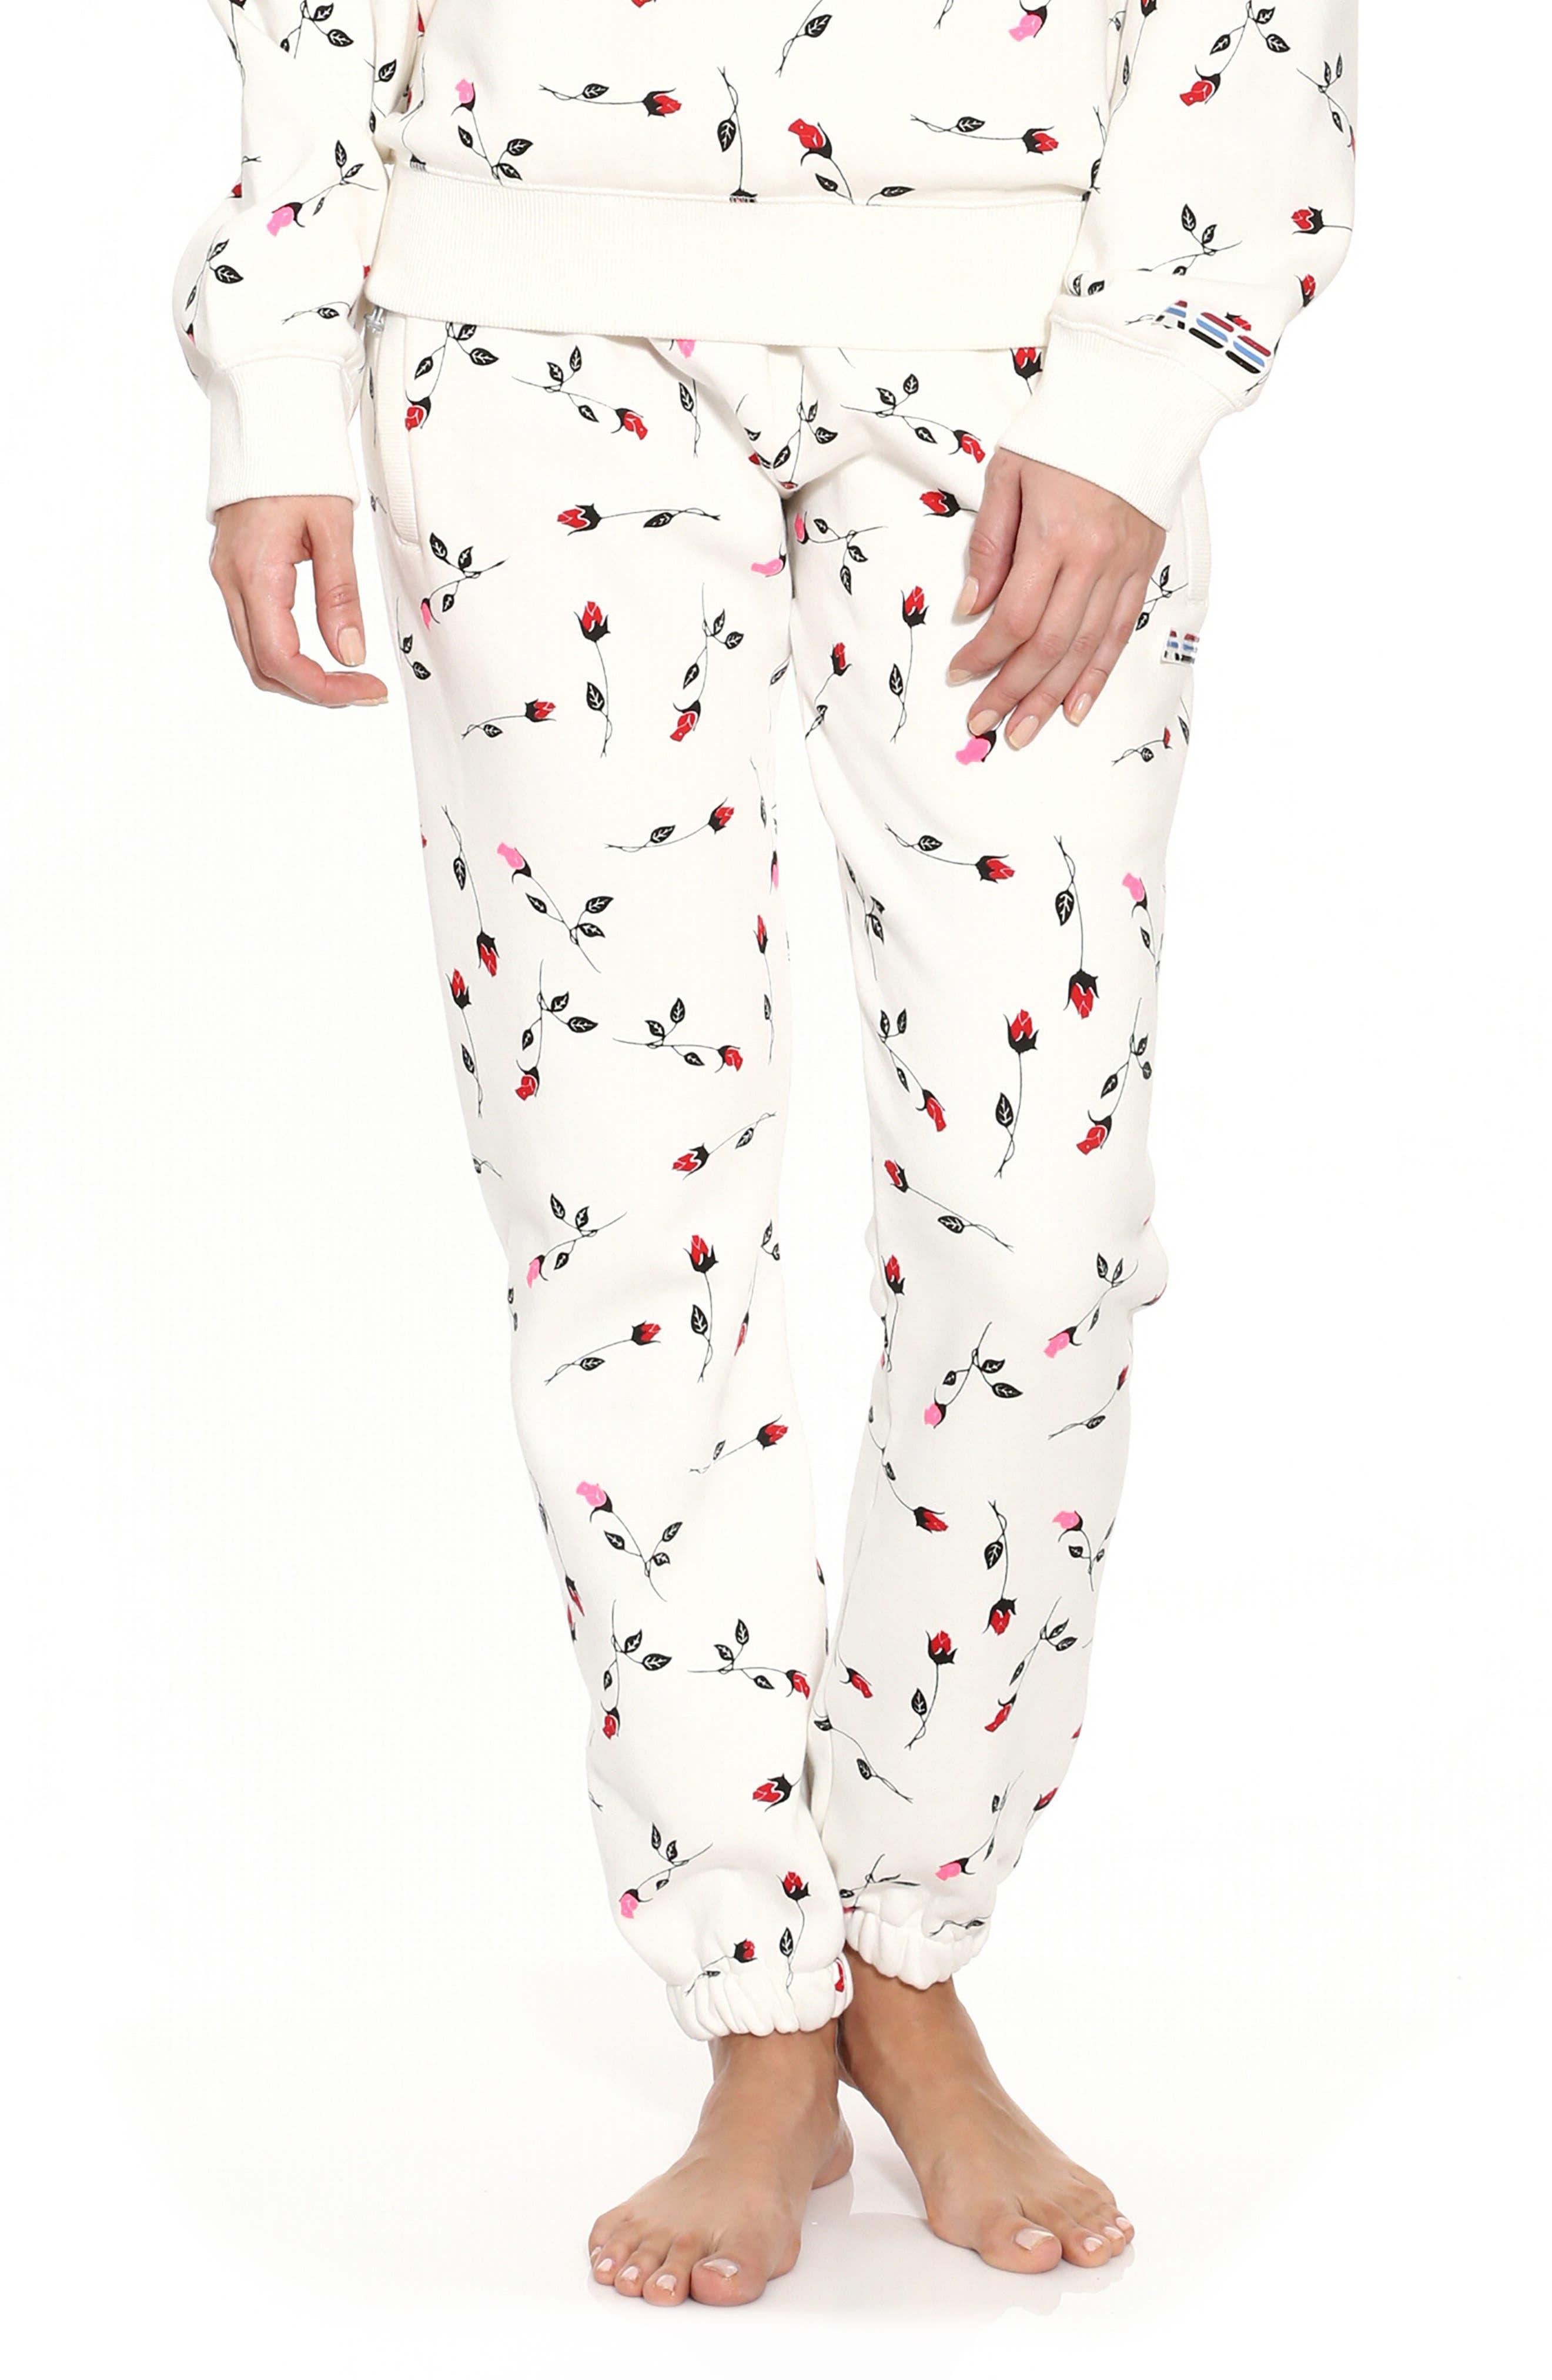 Adam Selman Rose Print Unisex Sweatpants, White